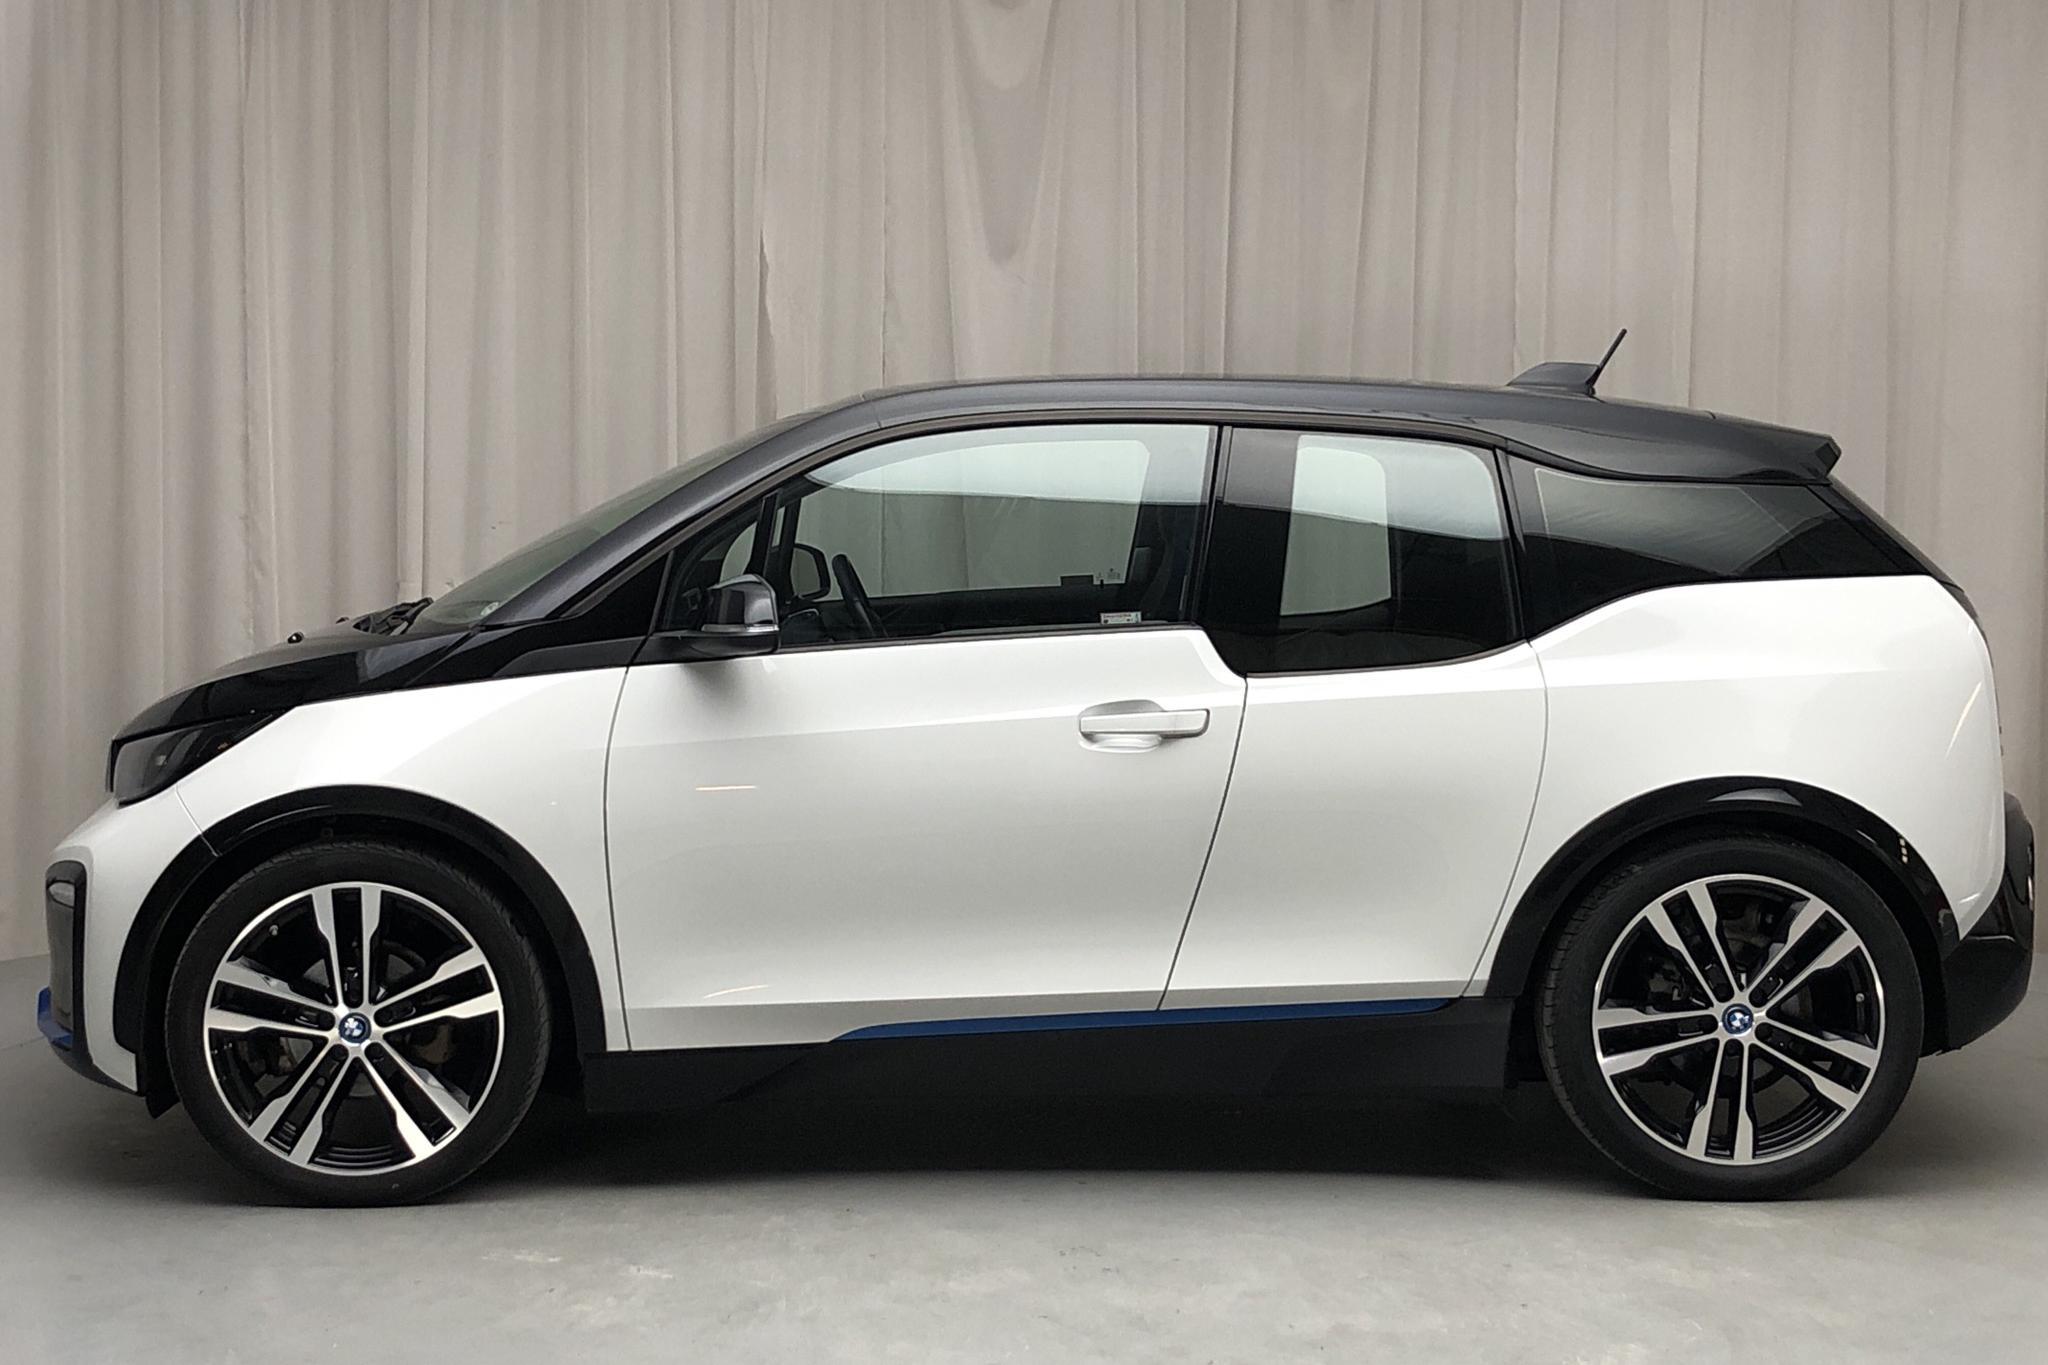 BMW i3s 120Ah, I01 (184hk) - 94 460 km - Automatic - white - 2019